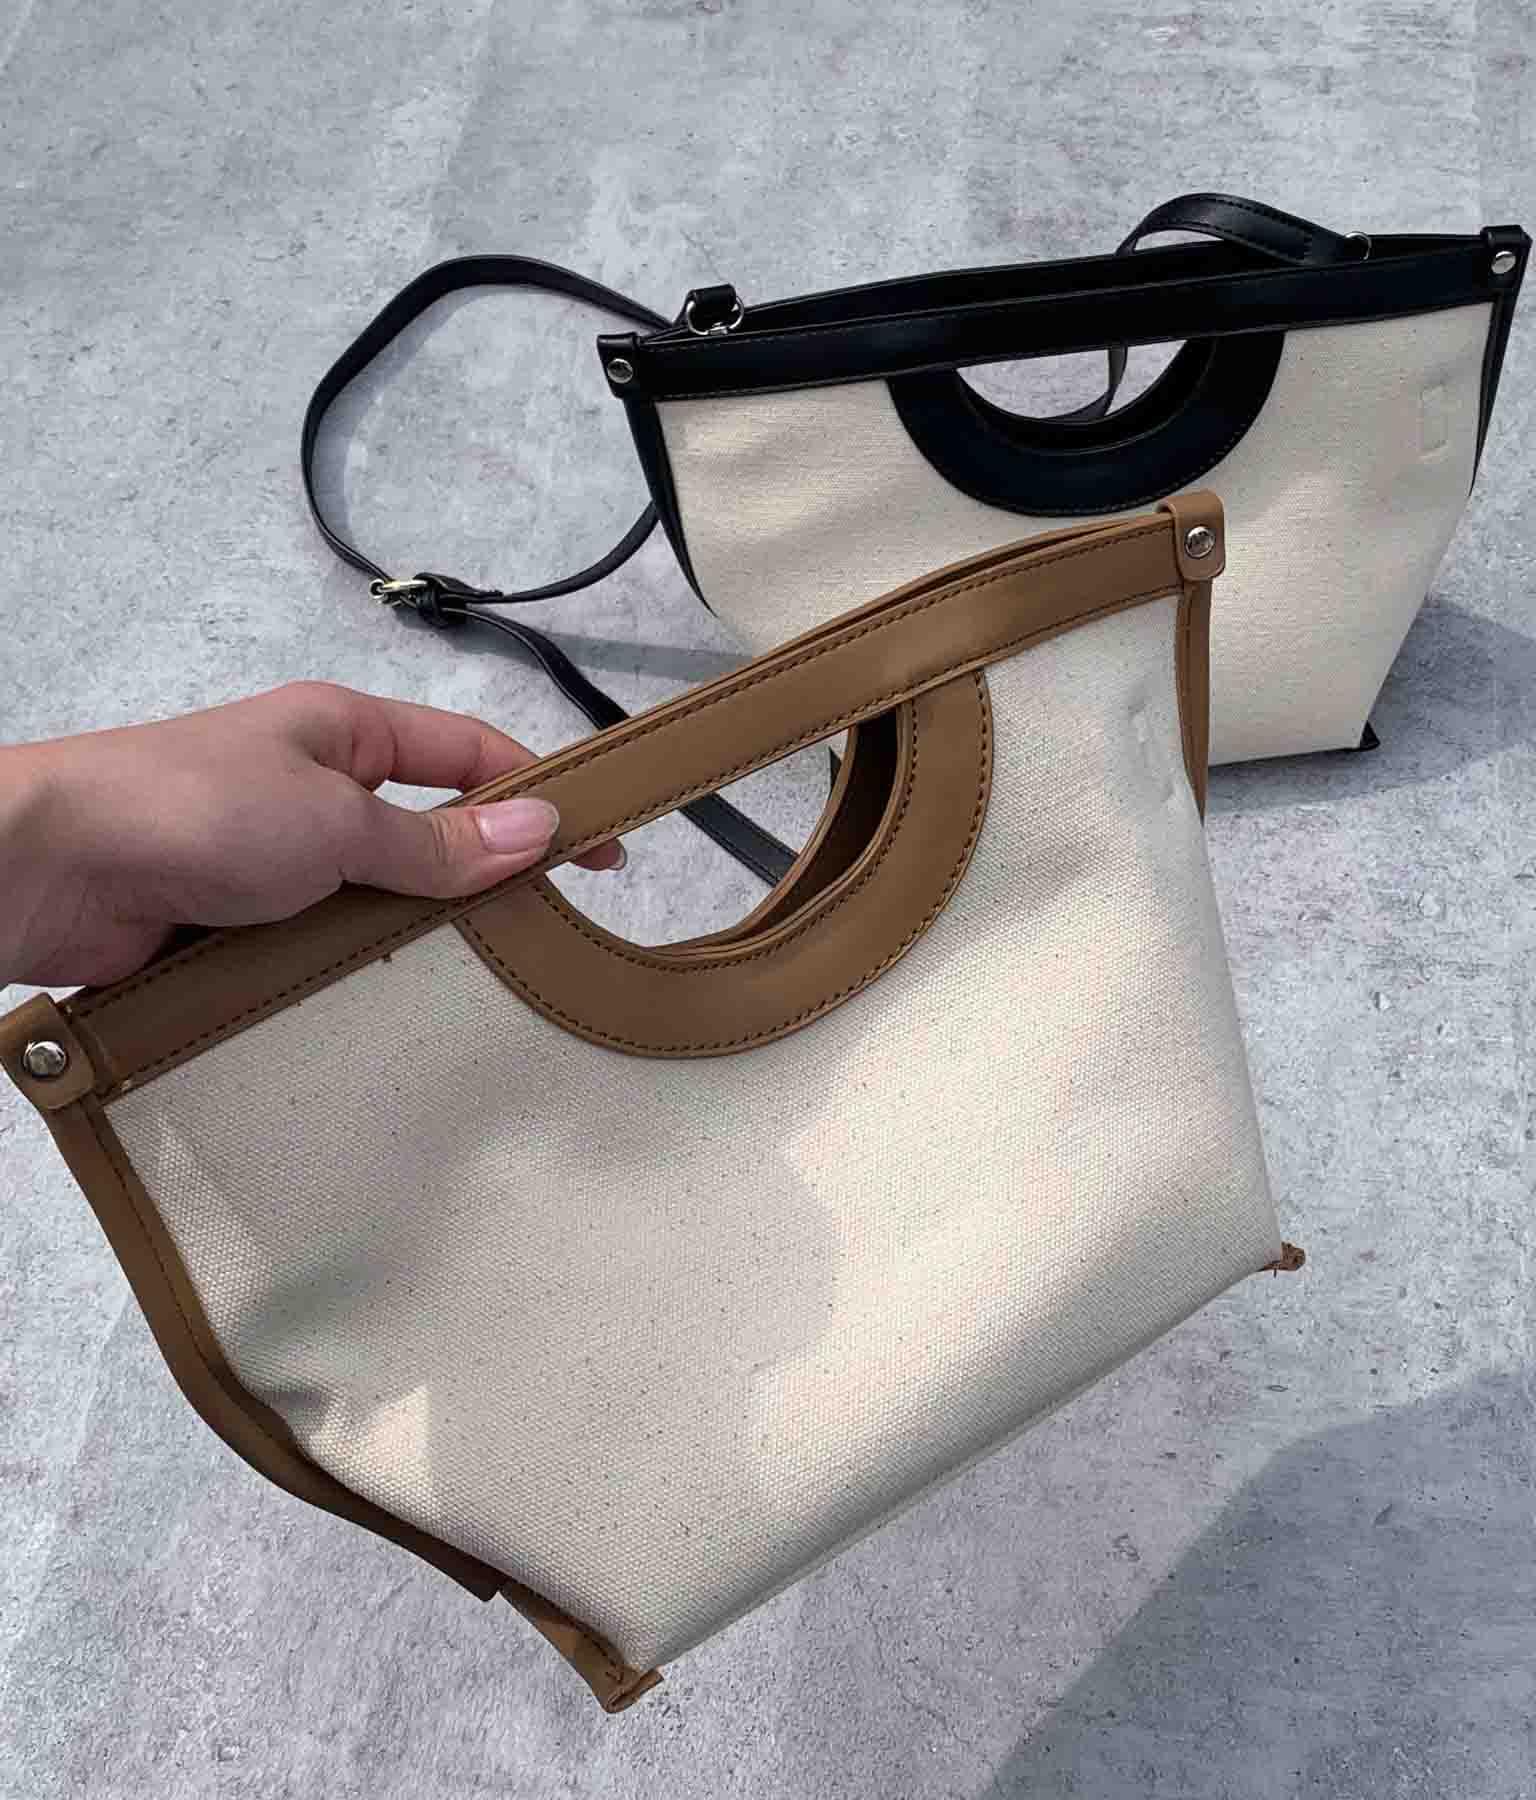 2WAYパイピングキャンバスバッグ(バッグ・鞄・小物/ショルダーバッグ) | ANAP